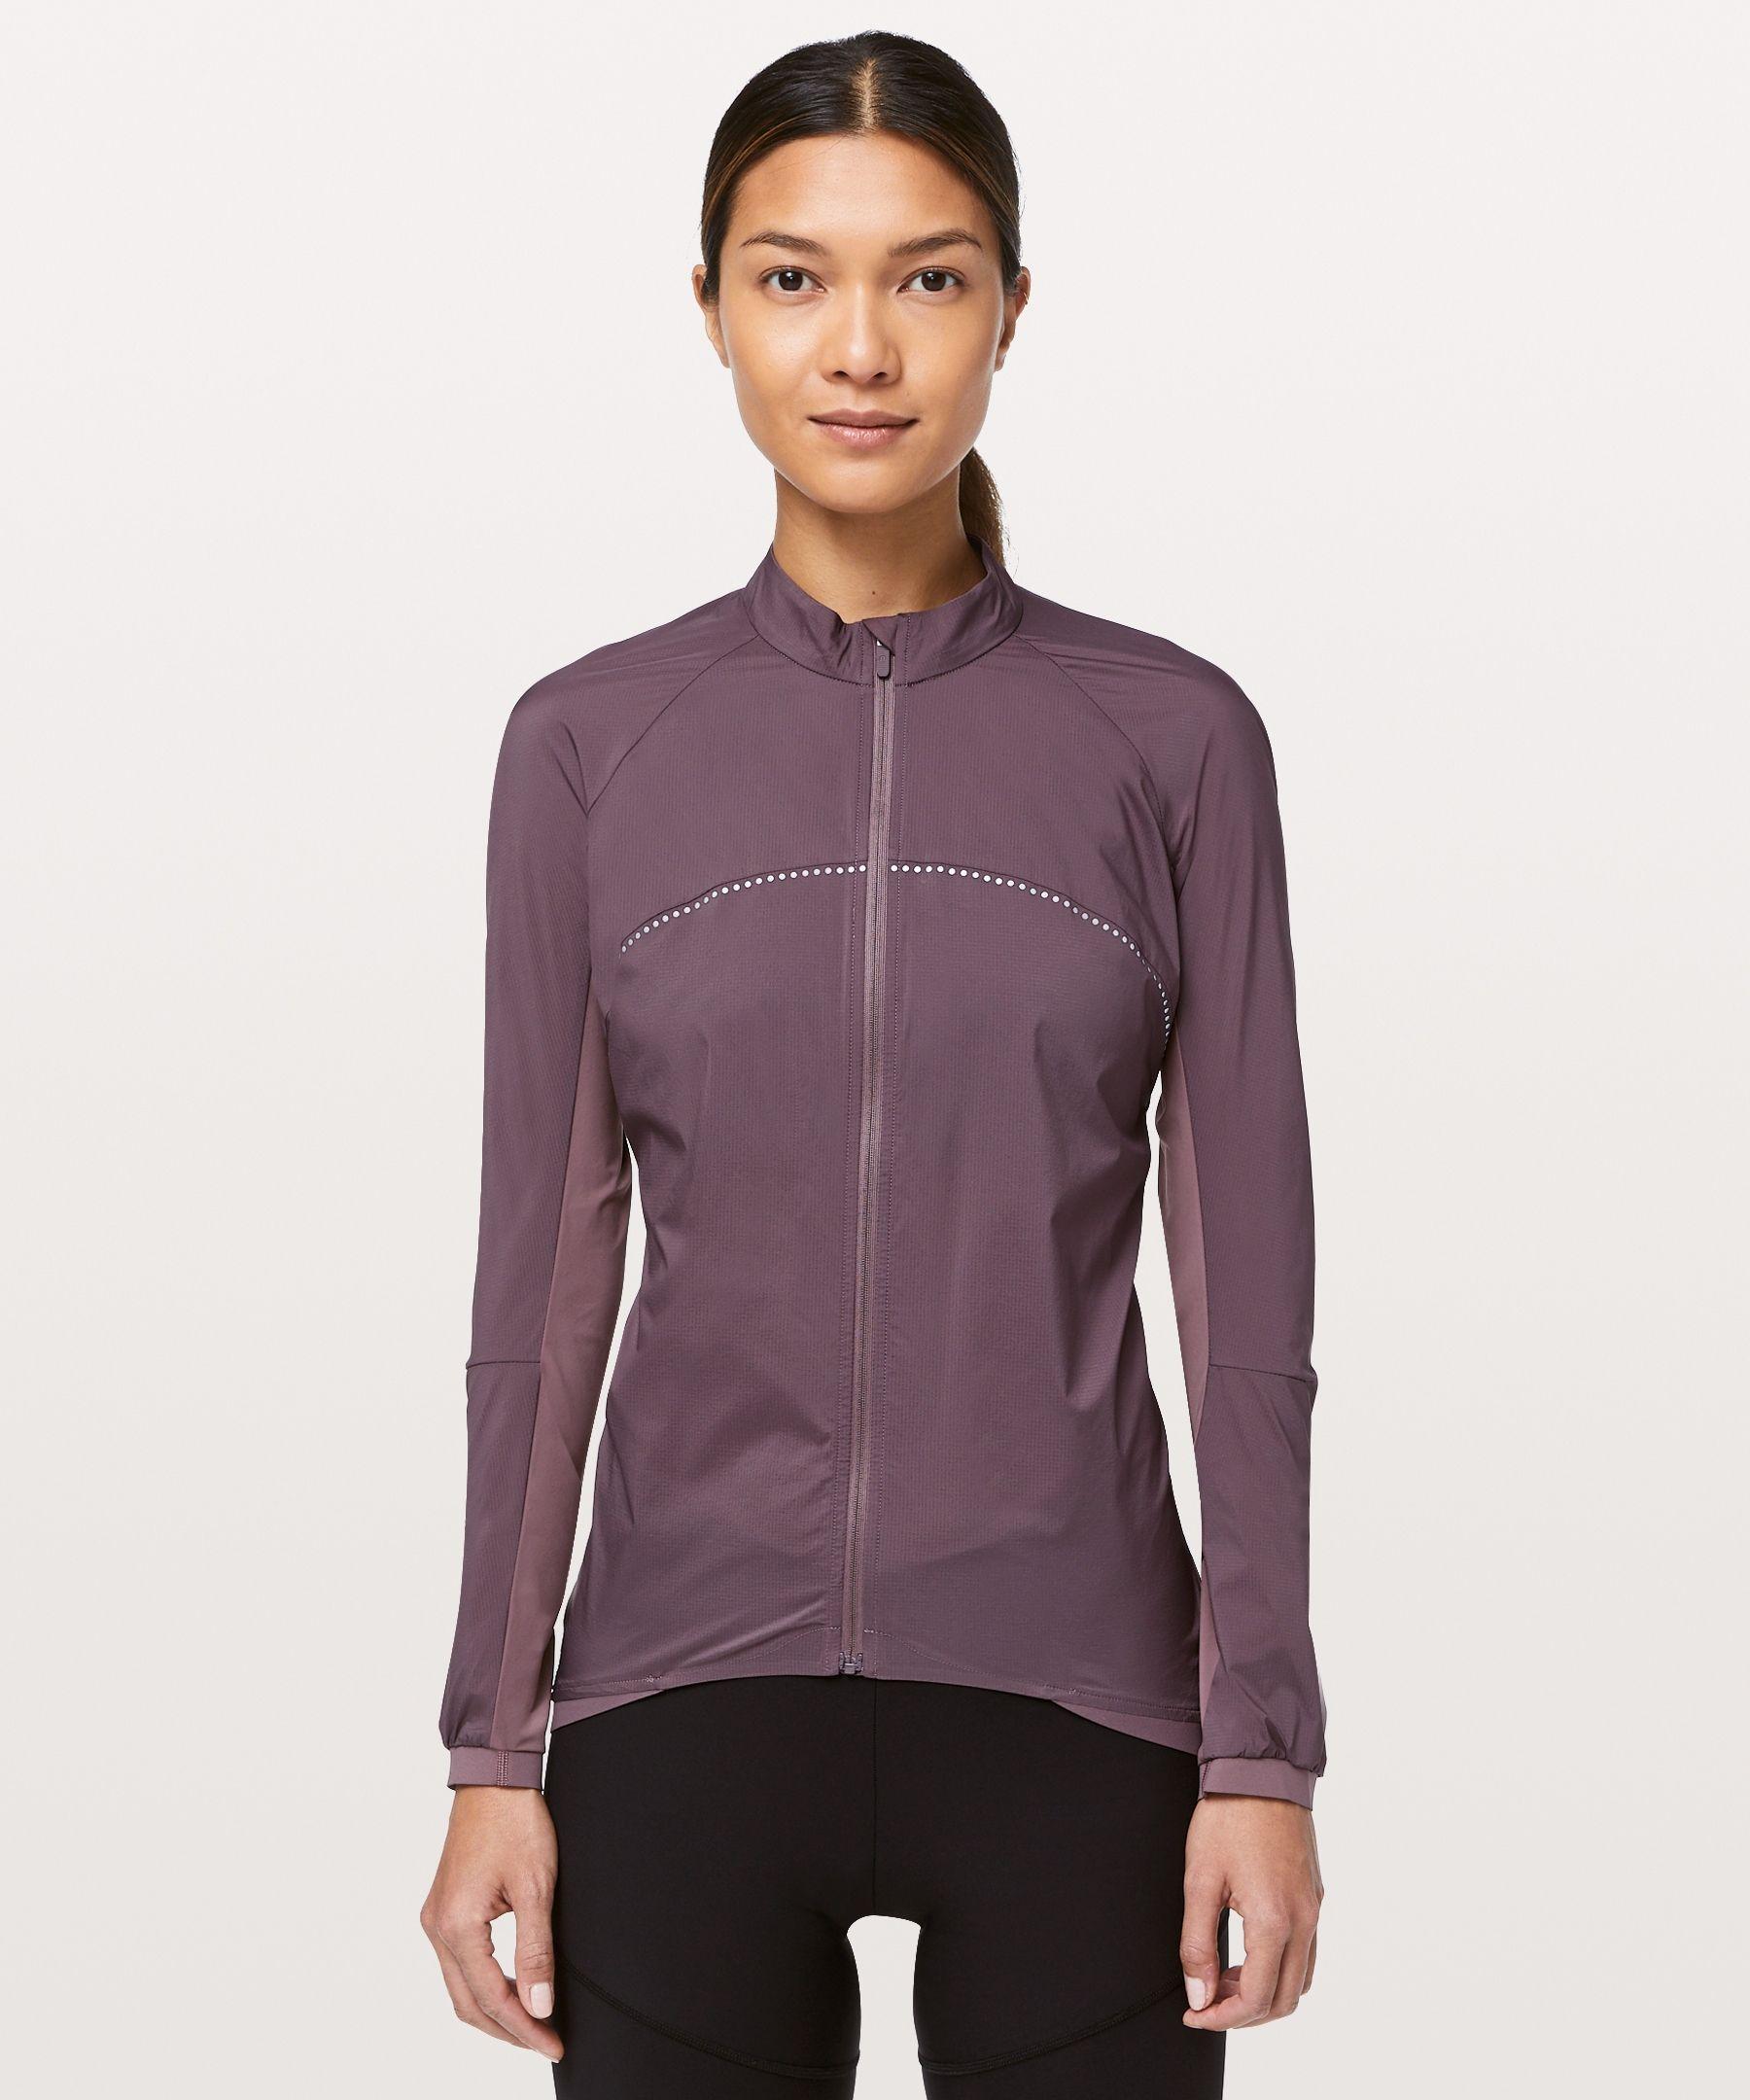 Lululemon Women S City To Summit Cycling Jacket Antique Bark Size Xs Jackets For Women Jackets Long Sleeve Shorts